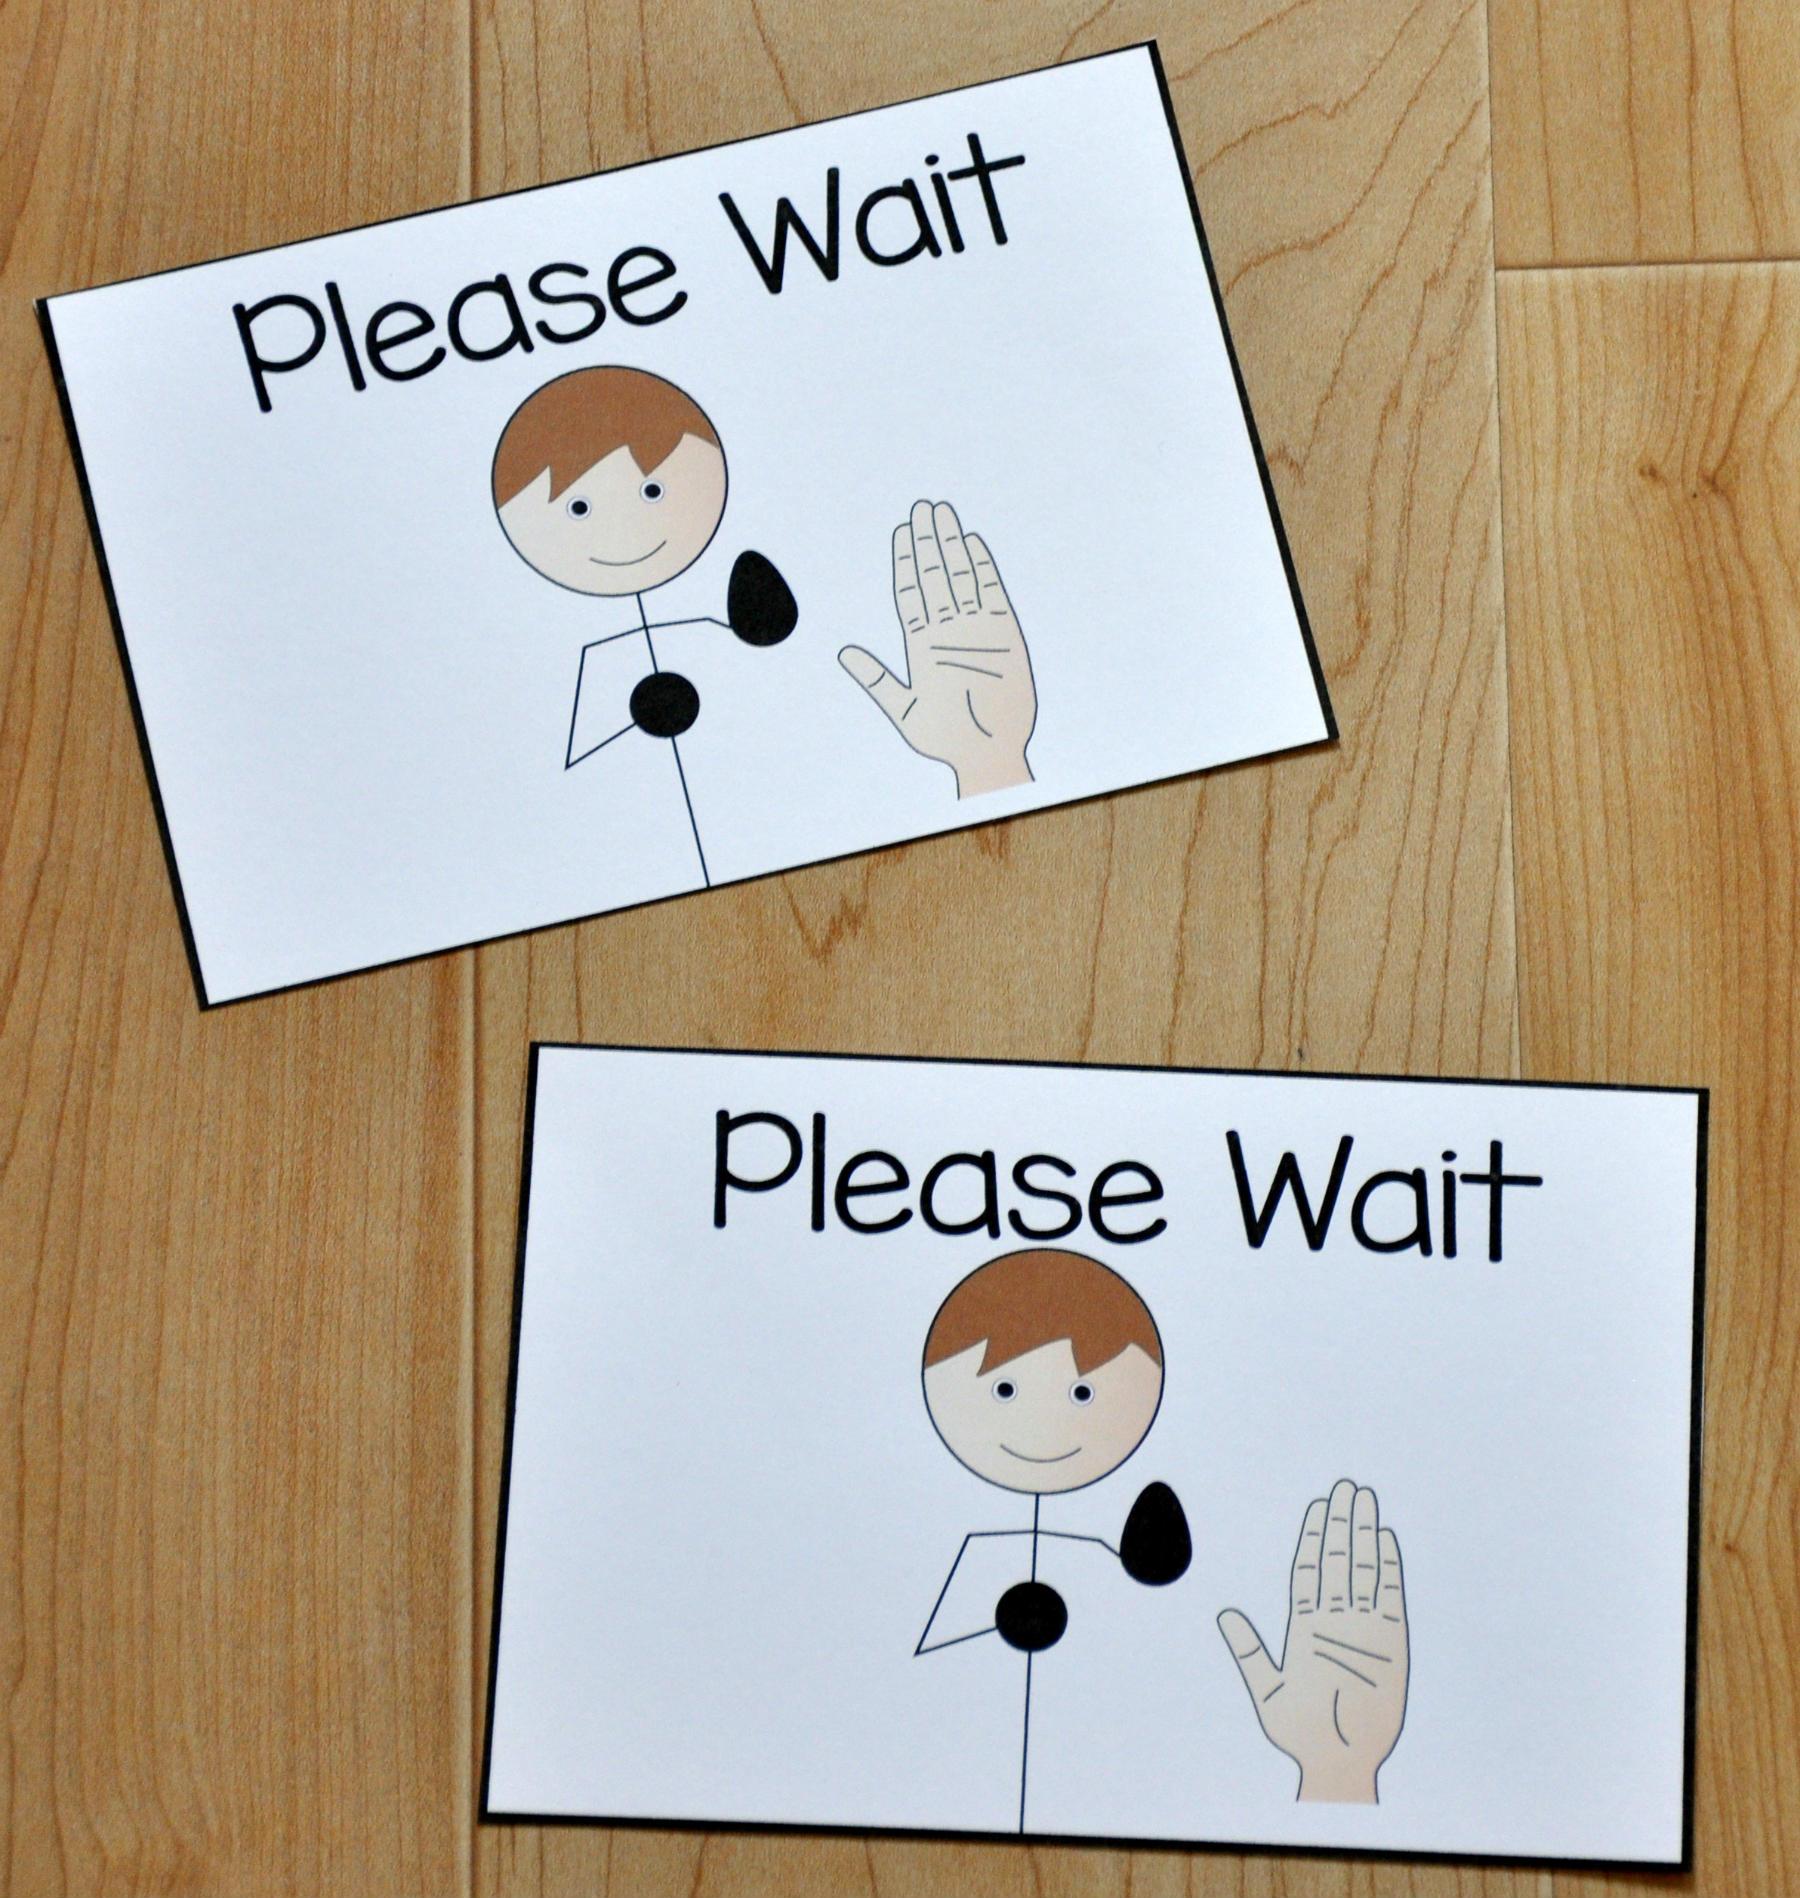 Please Wait Card